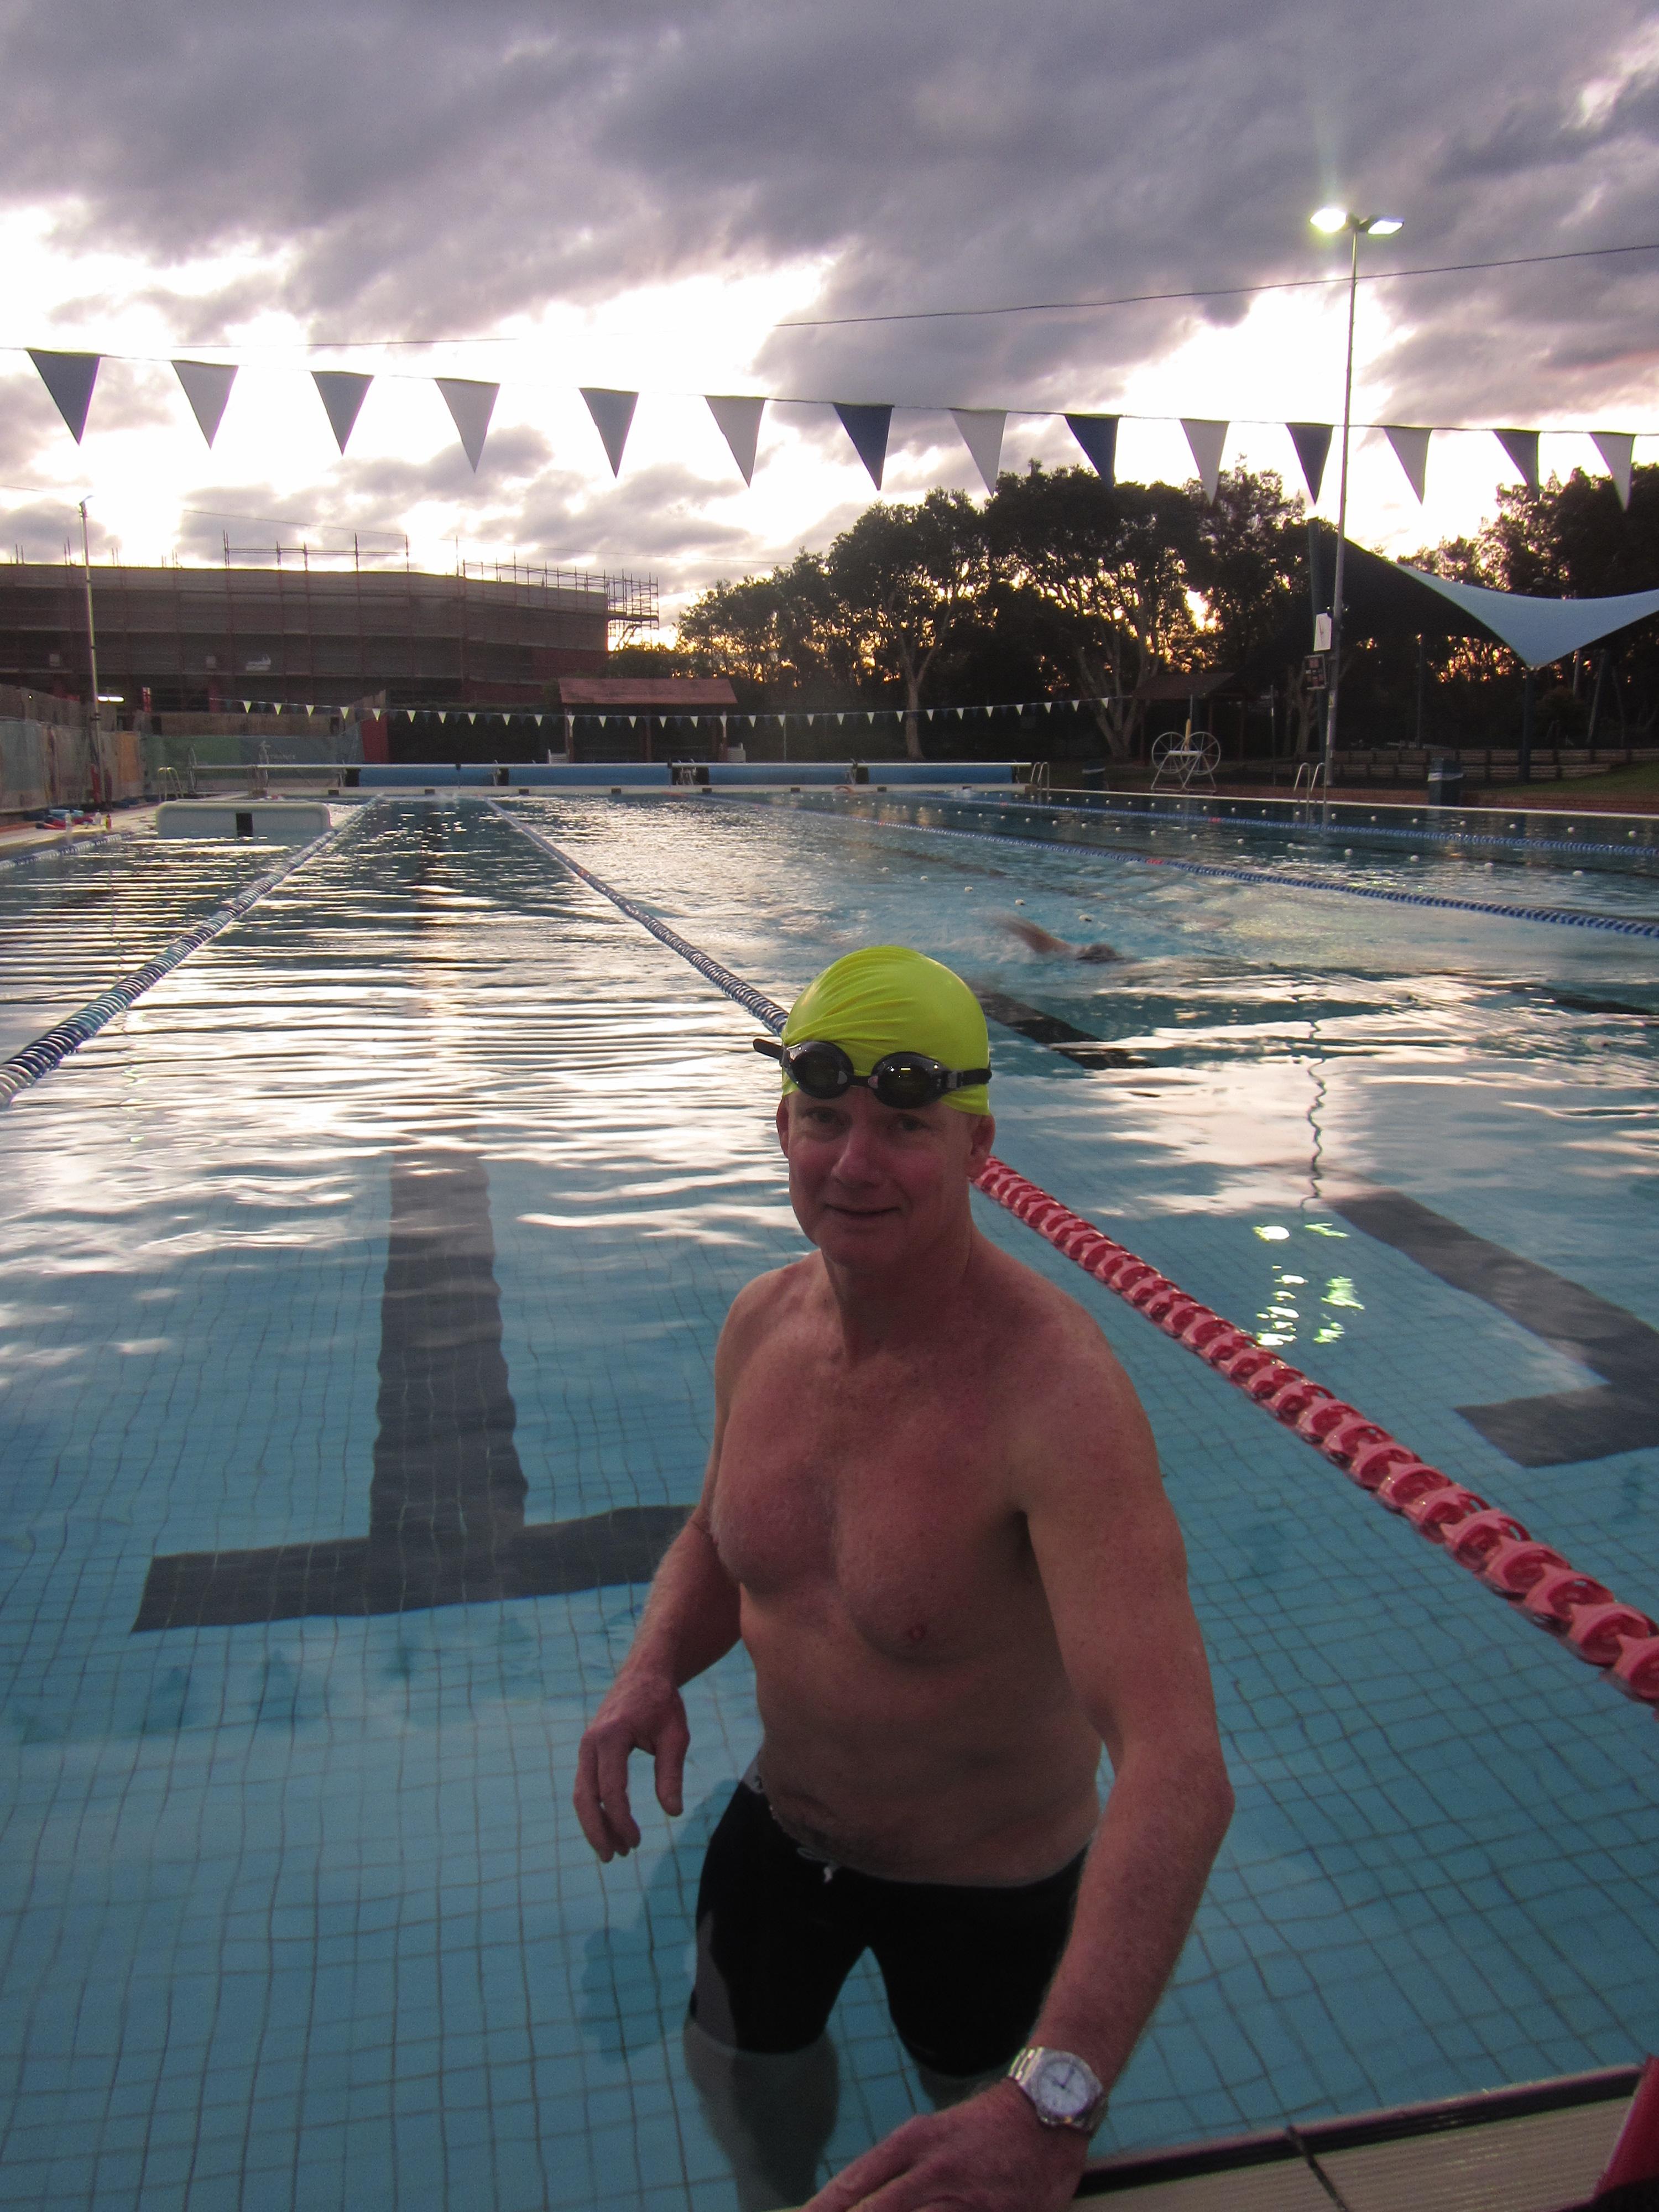 Dusk at Andrew Boy Charlton pool, Manly